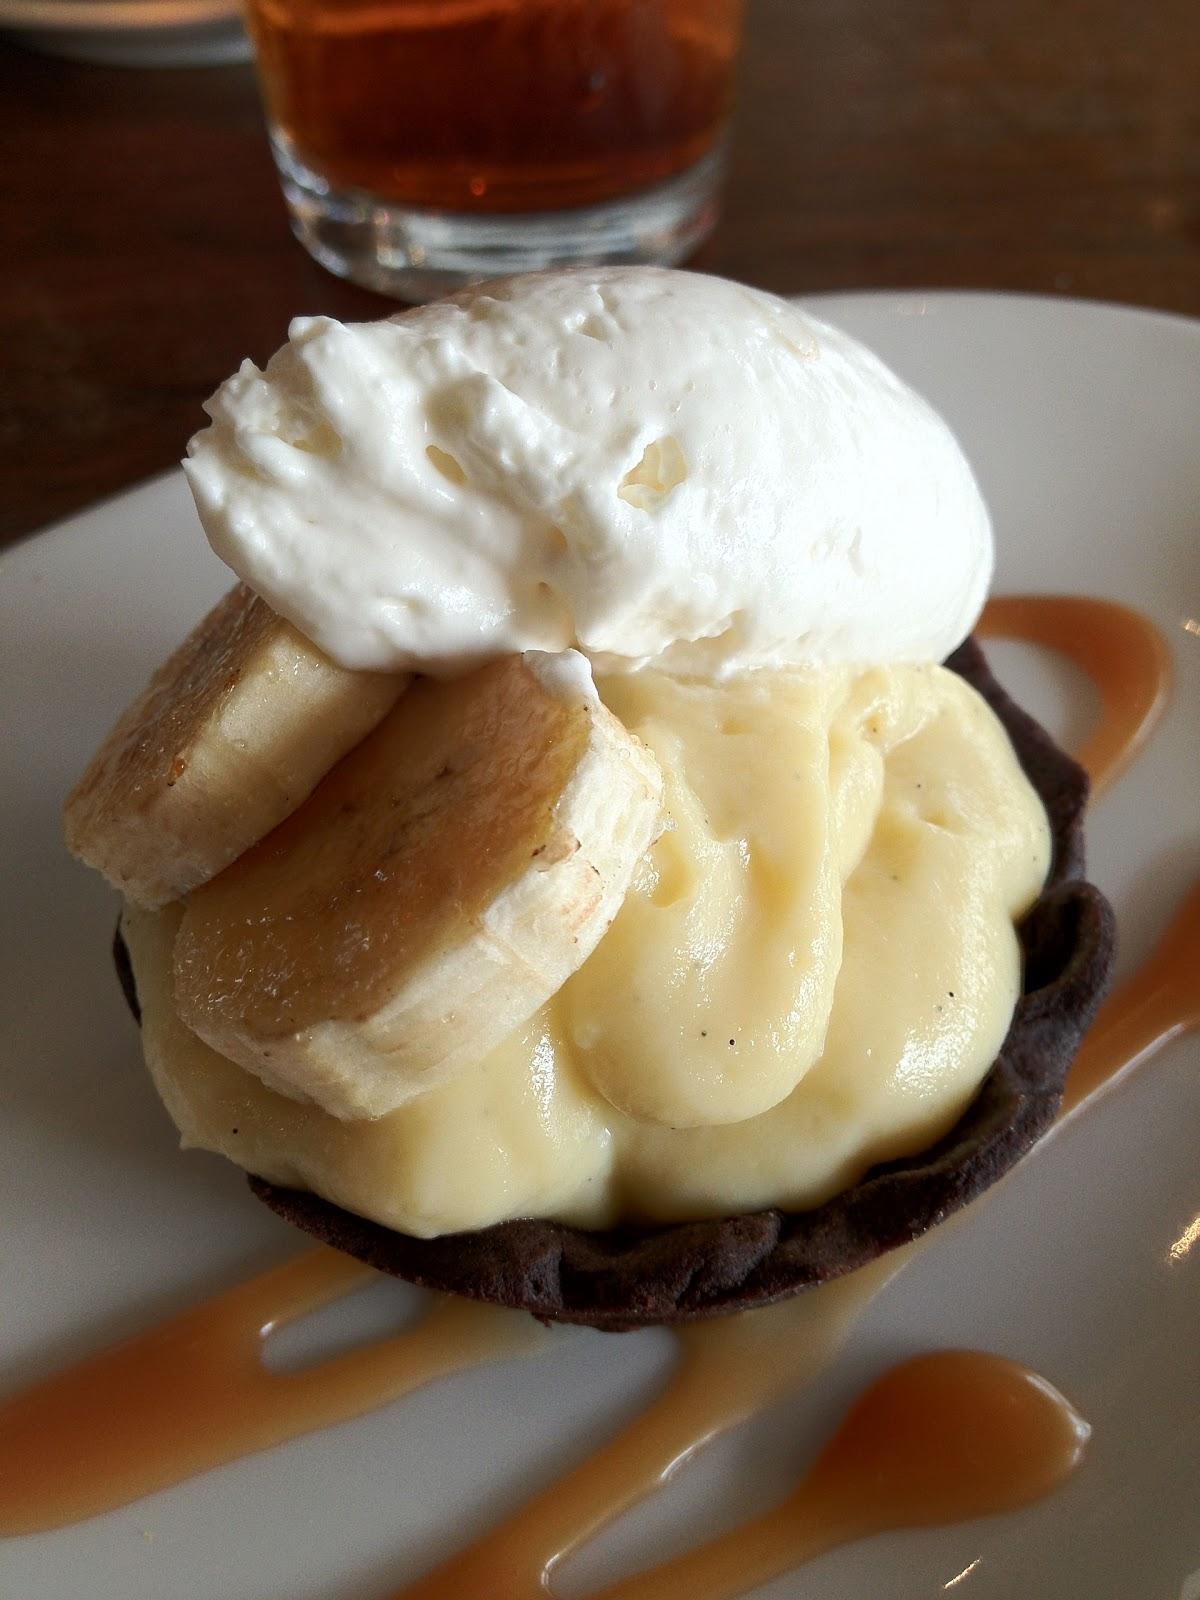 Accidental Cream Pie Cool just in case you weren't already hungry mini banana cream pie